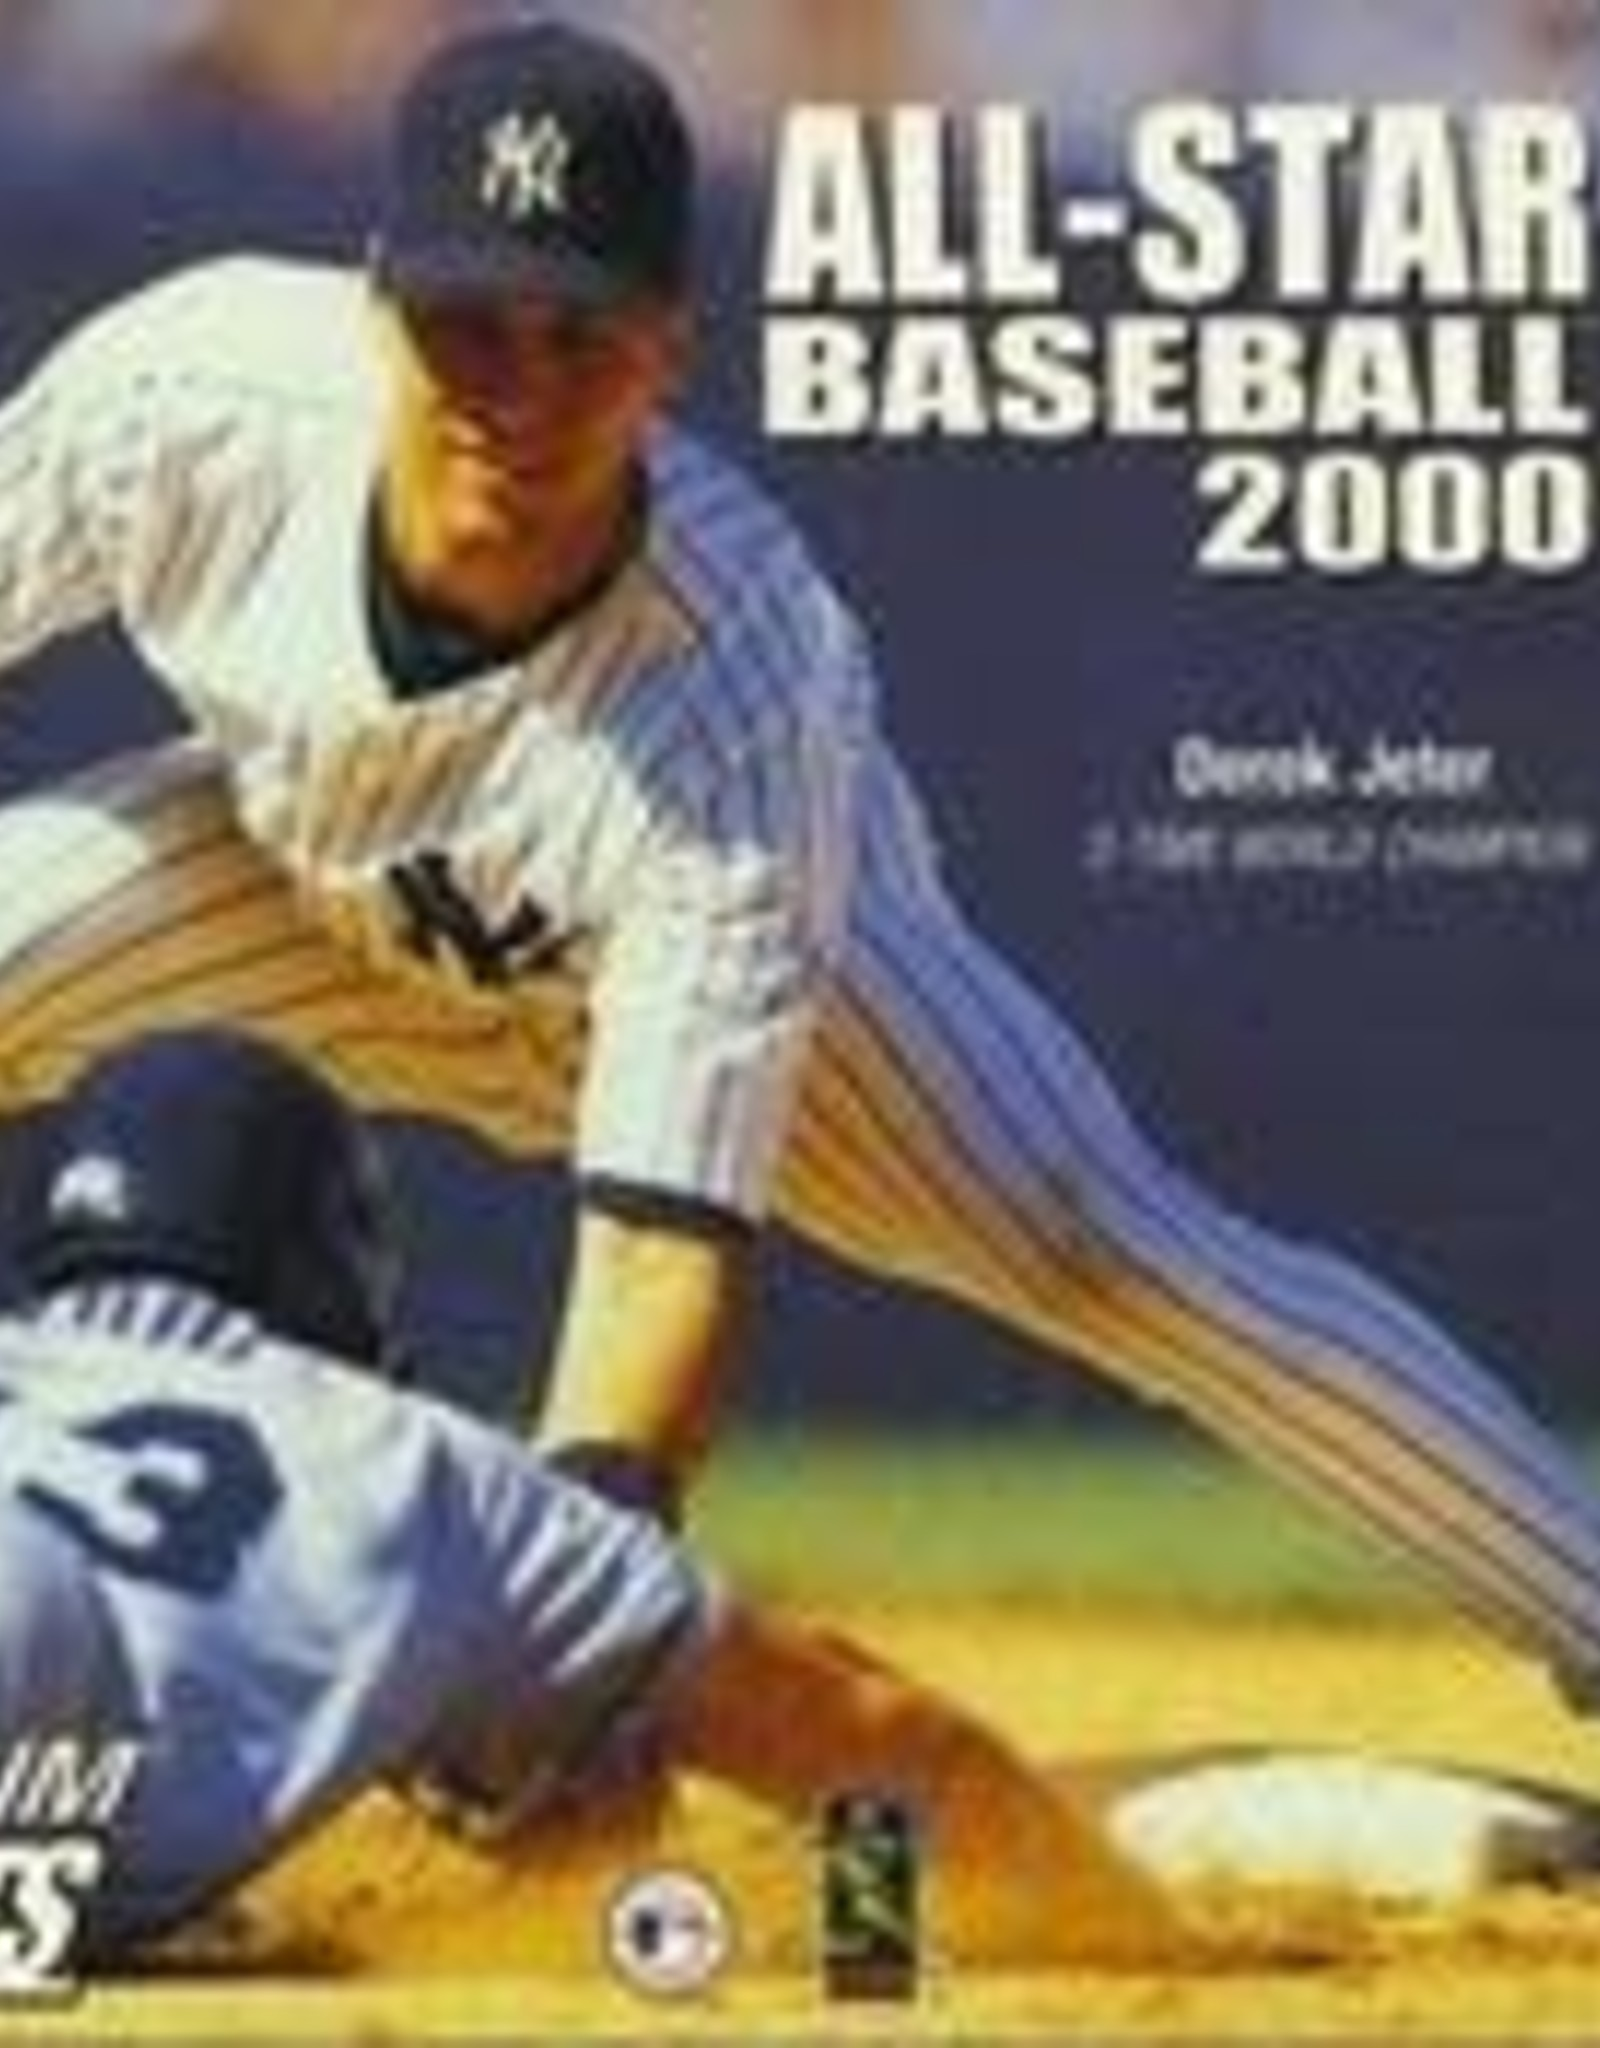 Nintendo 64 All-Star Baseball 2000